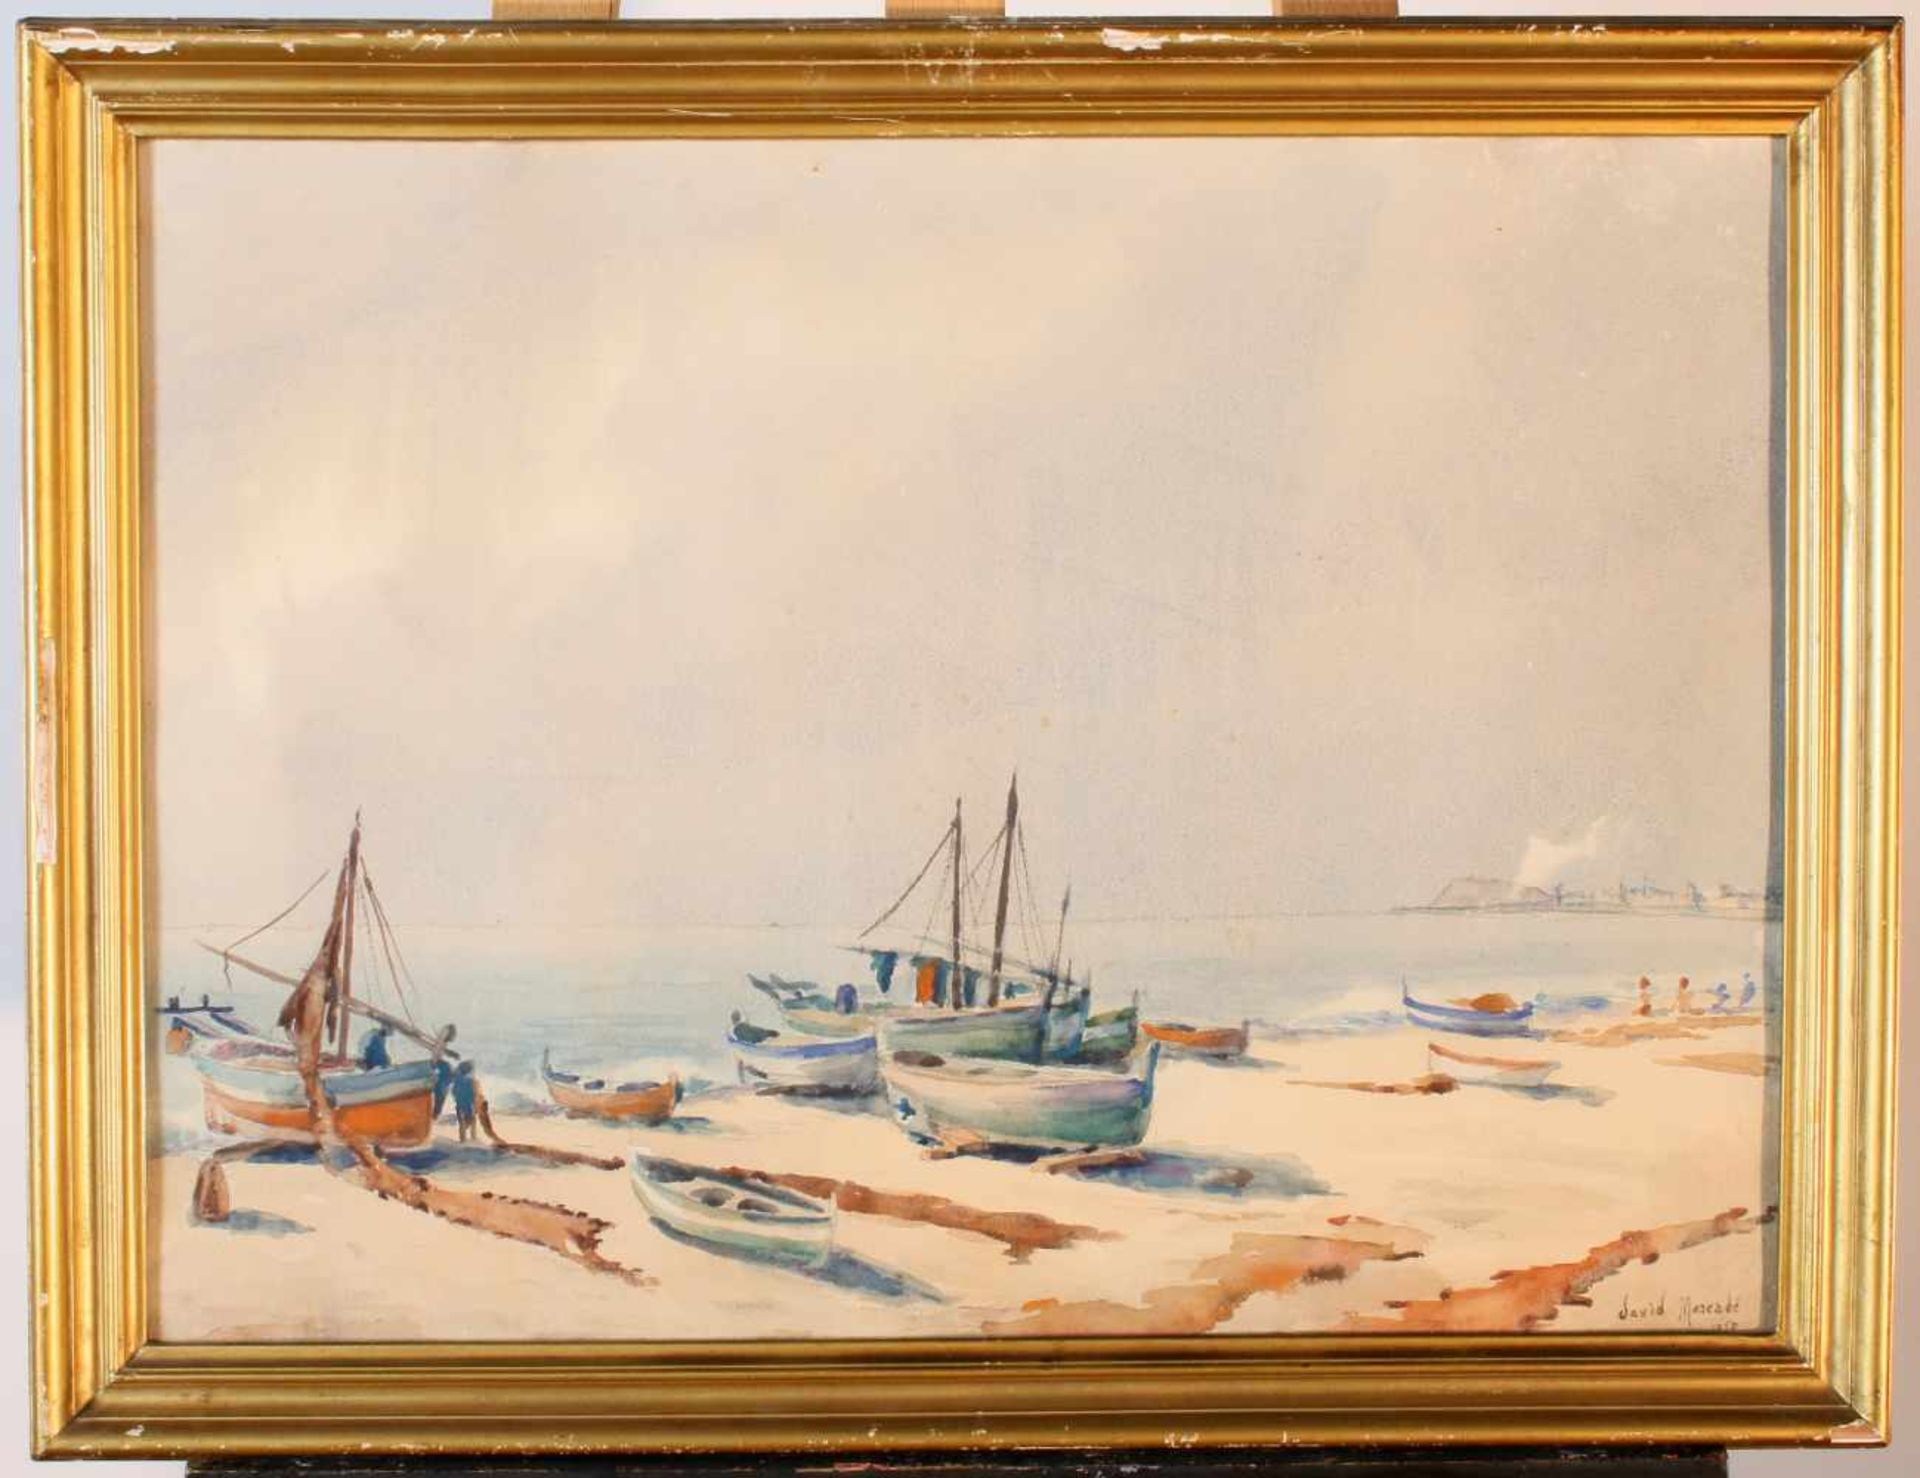 """Fischerboote am Strand"" - David Mercadé Recasens (20. Jahrhundert)Aquarell auf Papier, unten rechts - Bild 2 aus 3"